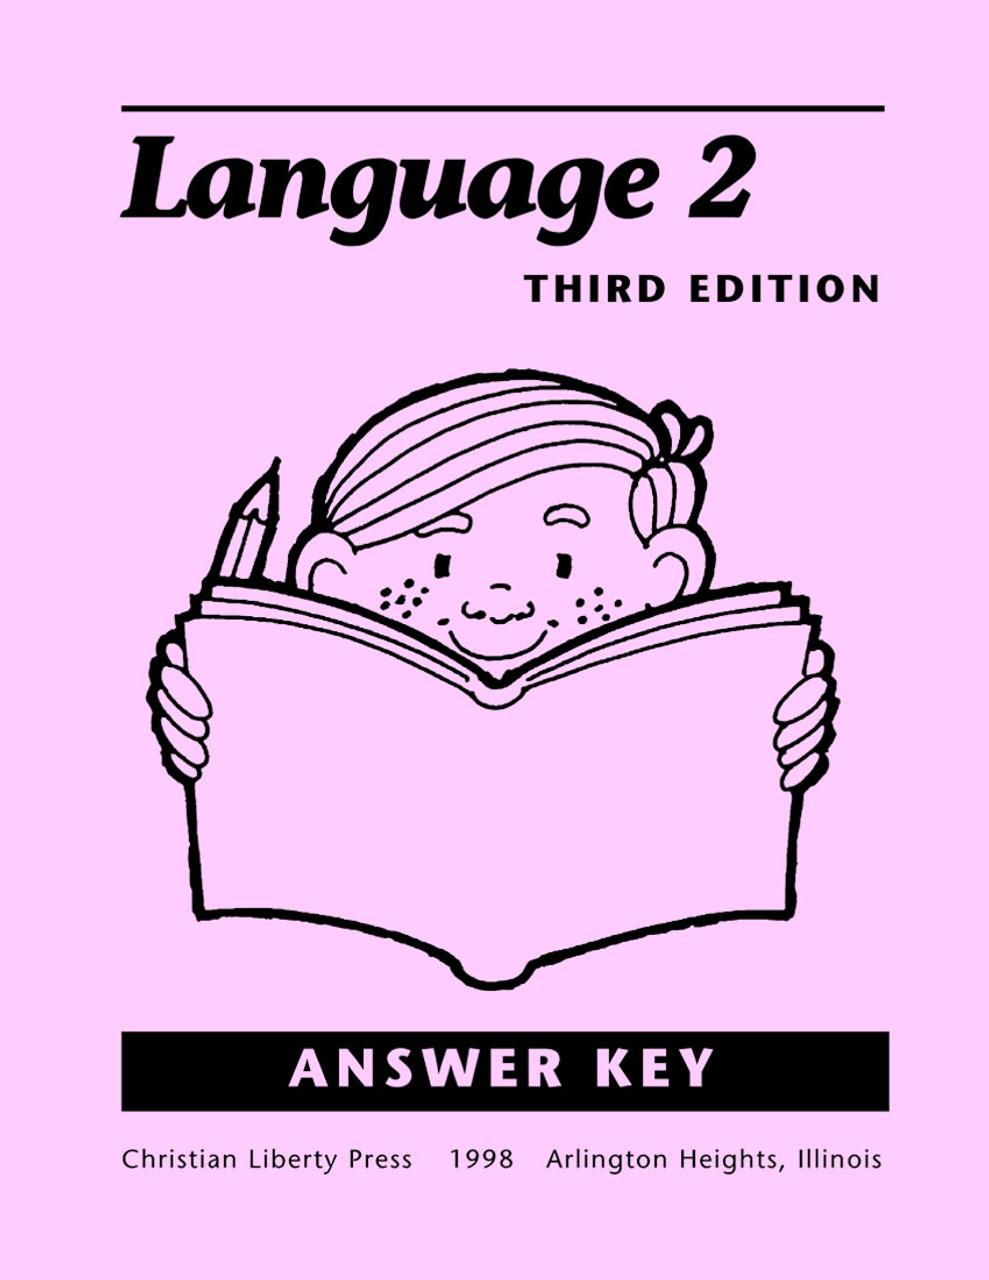 Language 2, 3rd edition - Answer Key